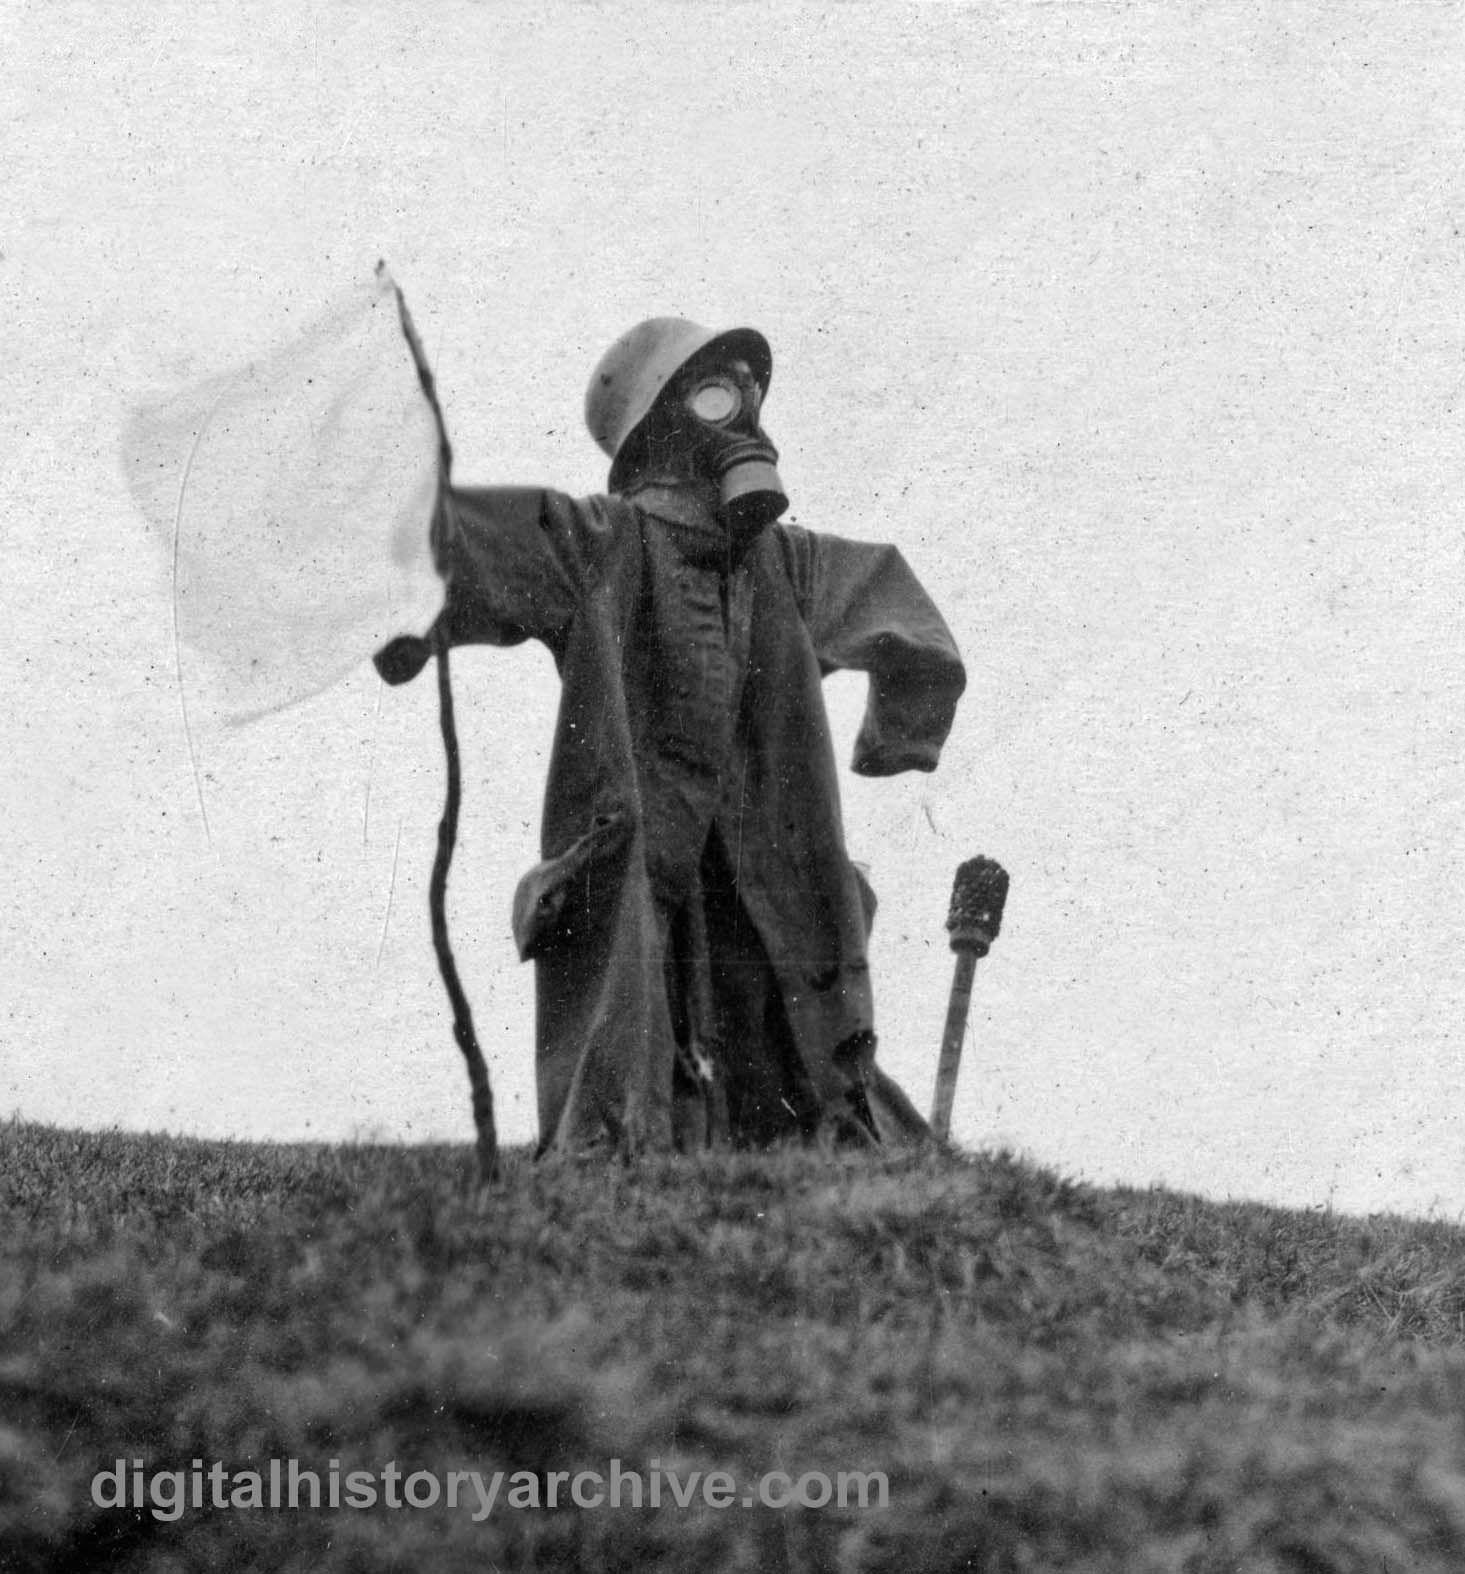 WWI, 1918. A surrender \